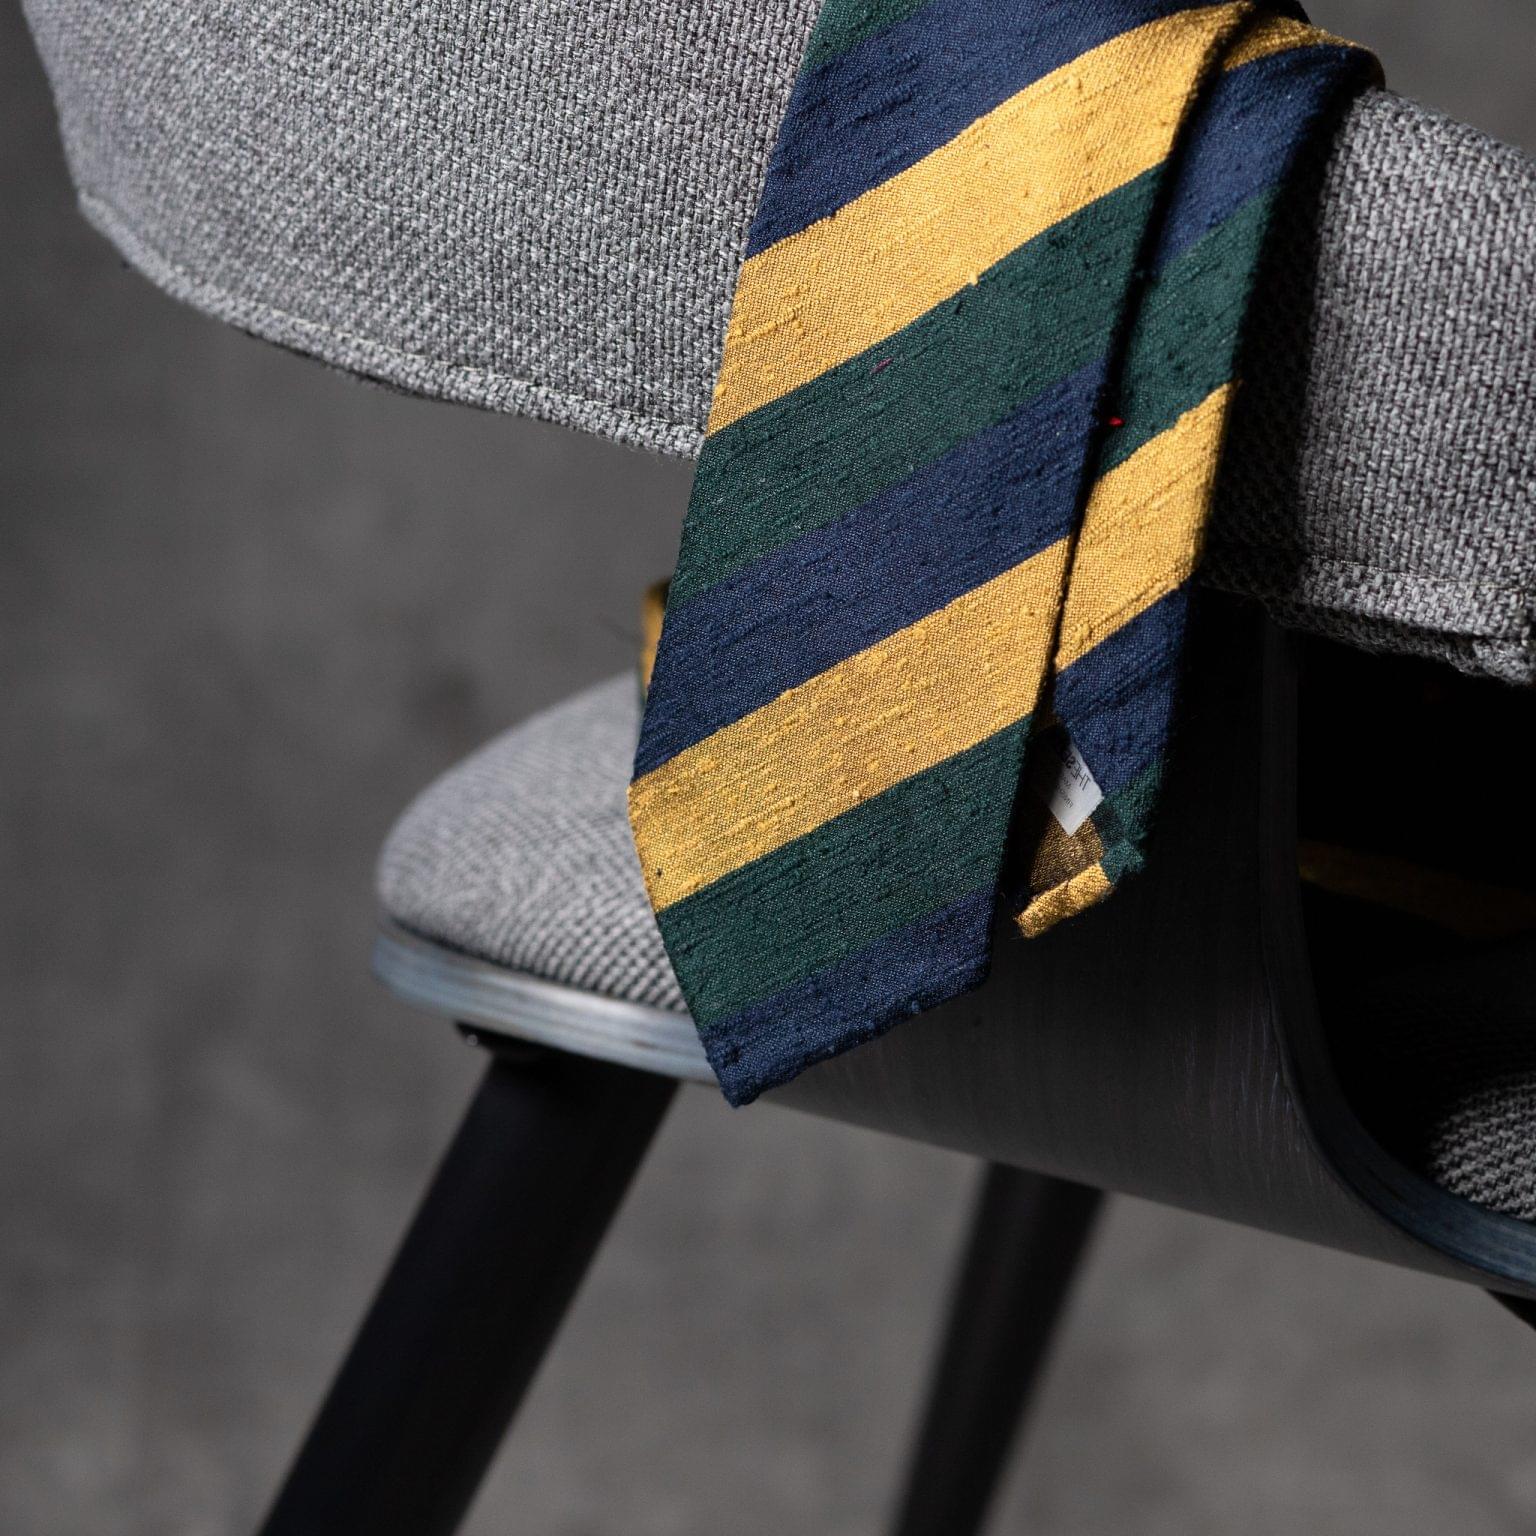 SHANTUNG-0355-Tie-Initials-Corbata-Iniciales-The-Seelk-2